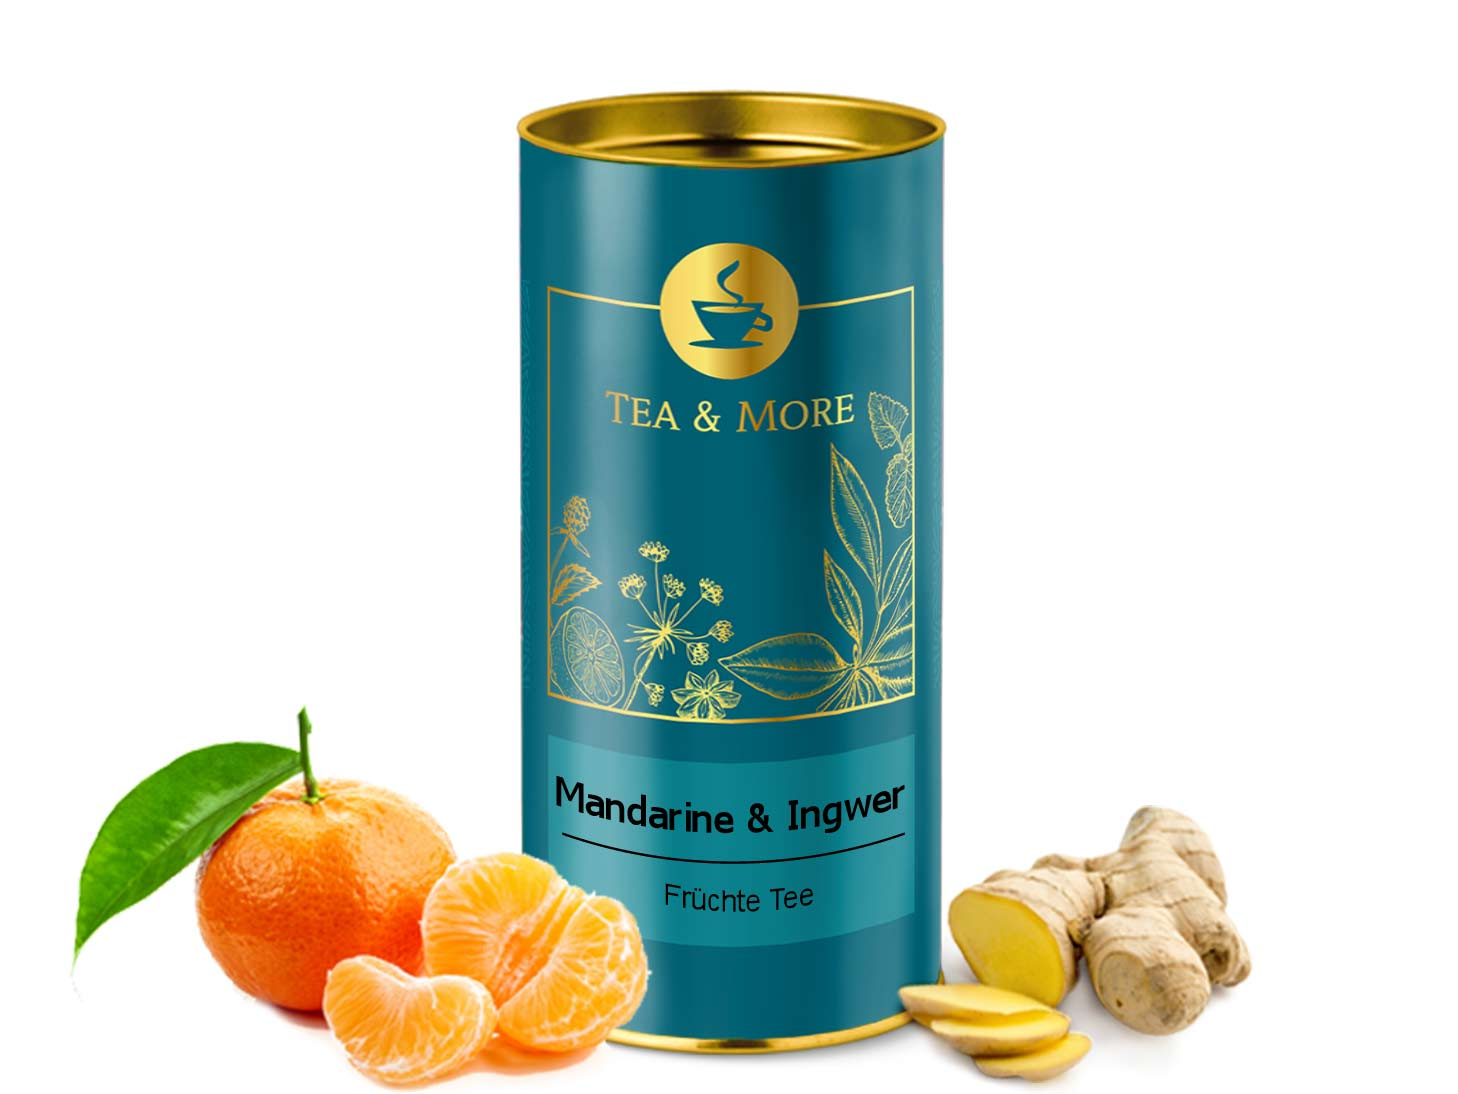 Mandarine & Ingwer